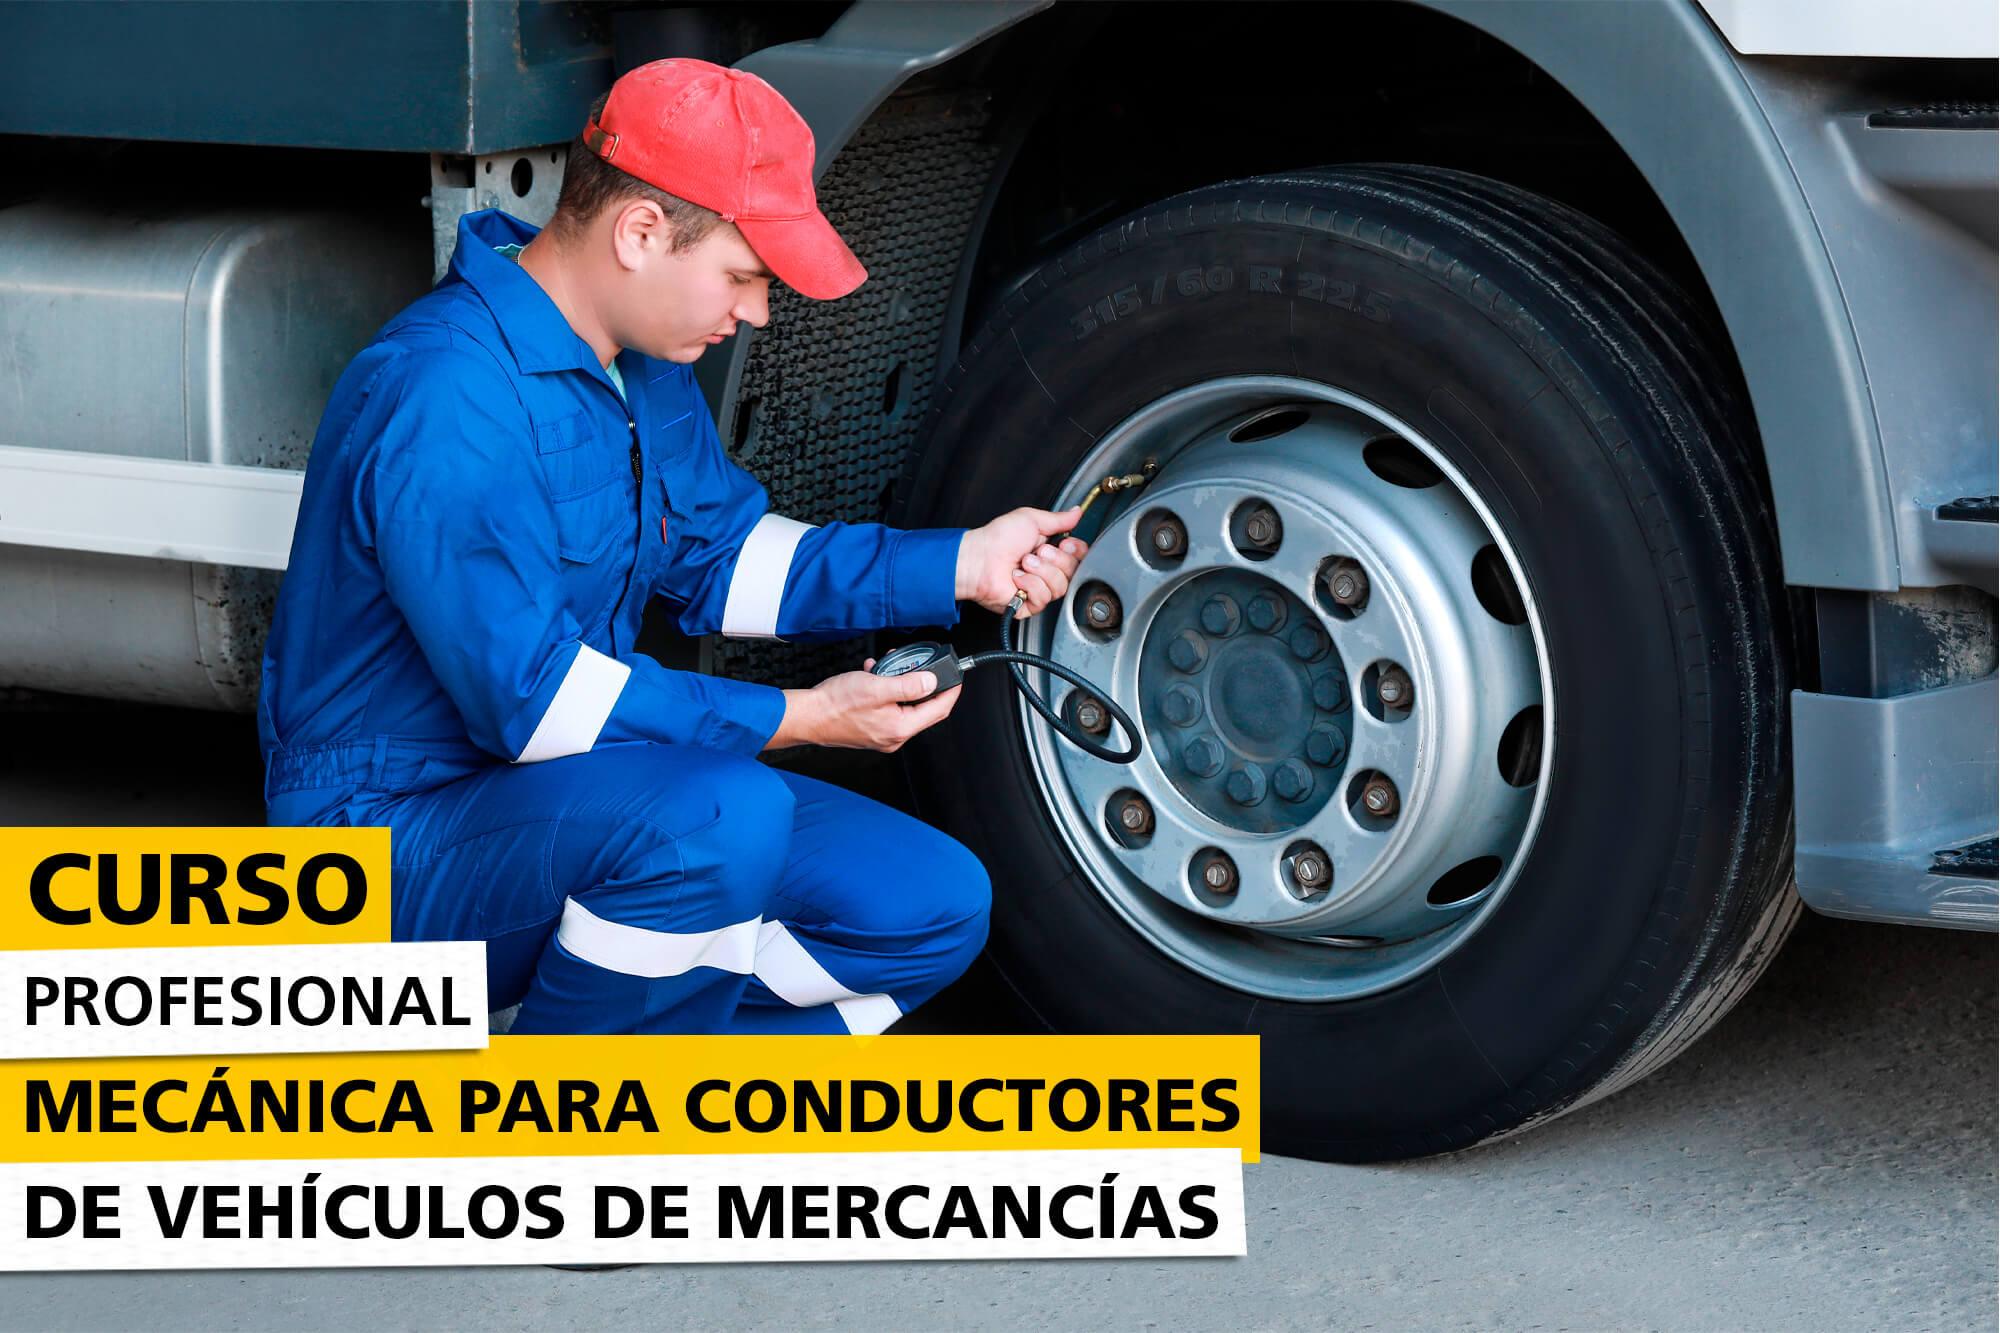 curso-profesional-mecanica-conductores-vehiculos-mercancias-img-destacada